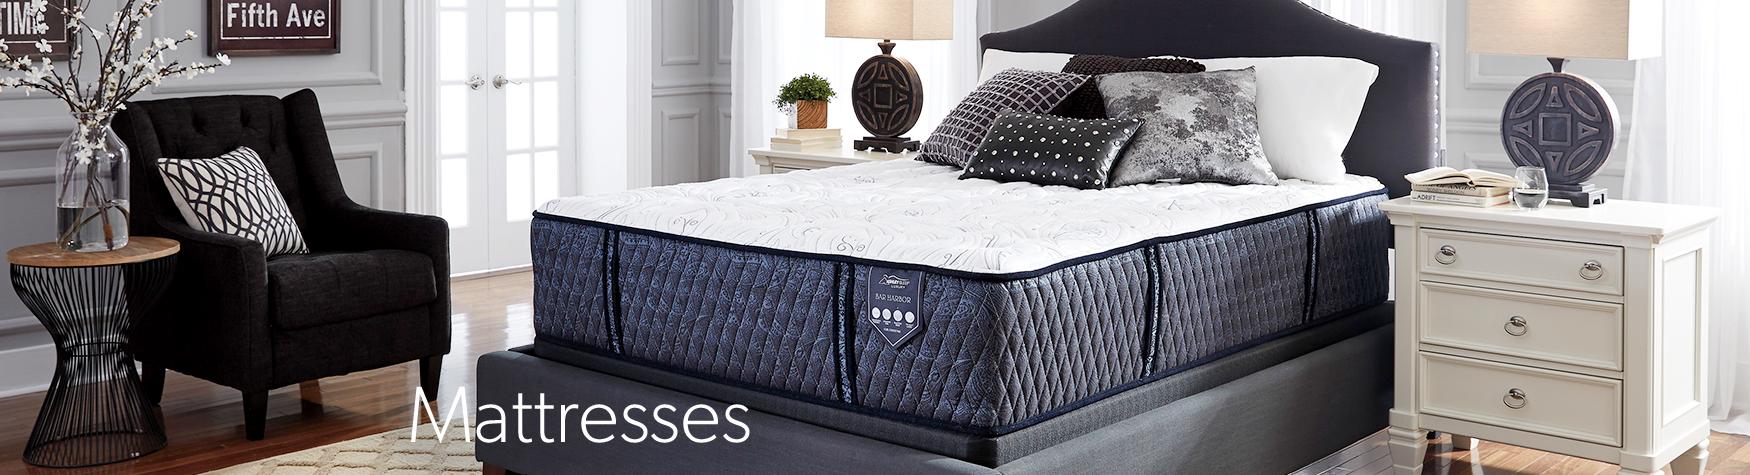 mattresses-banner.png